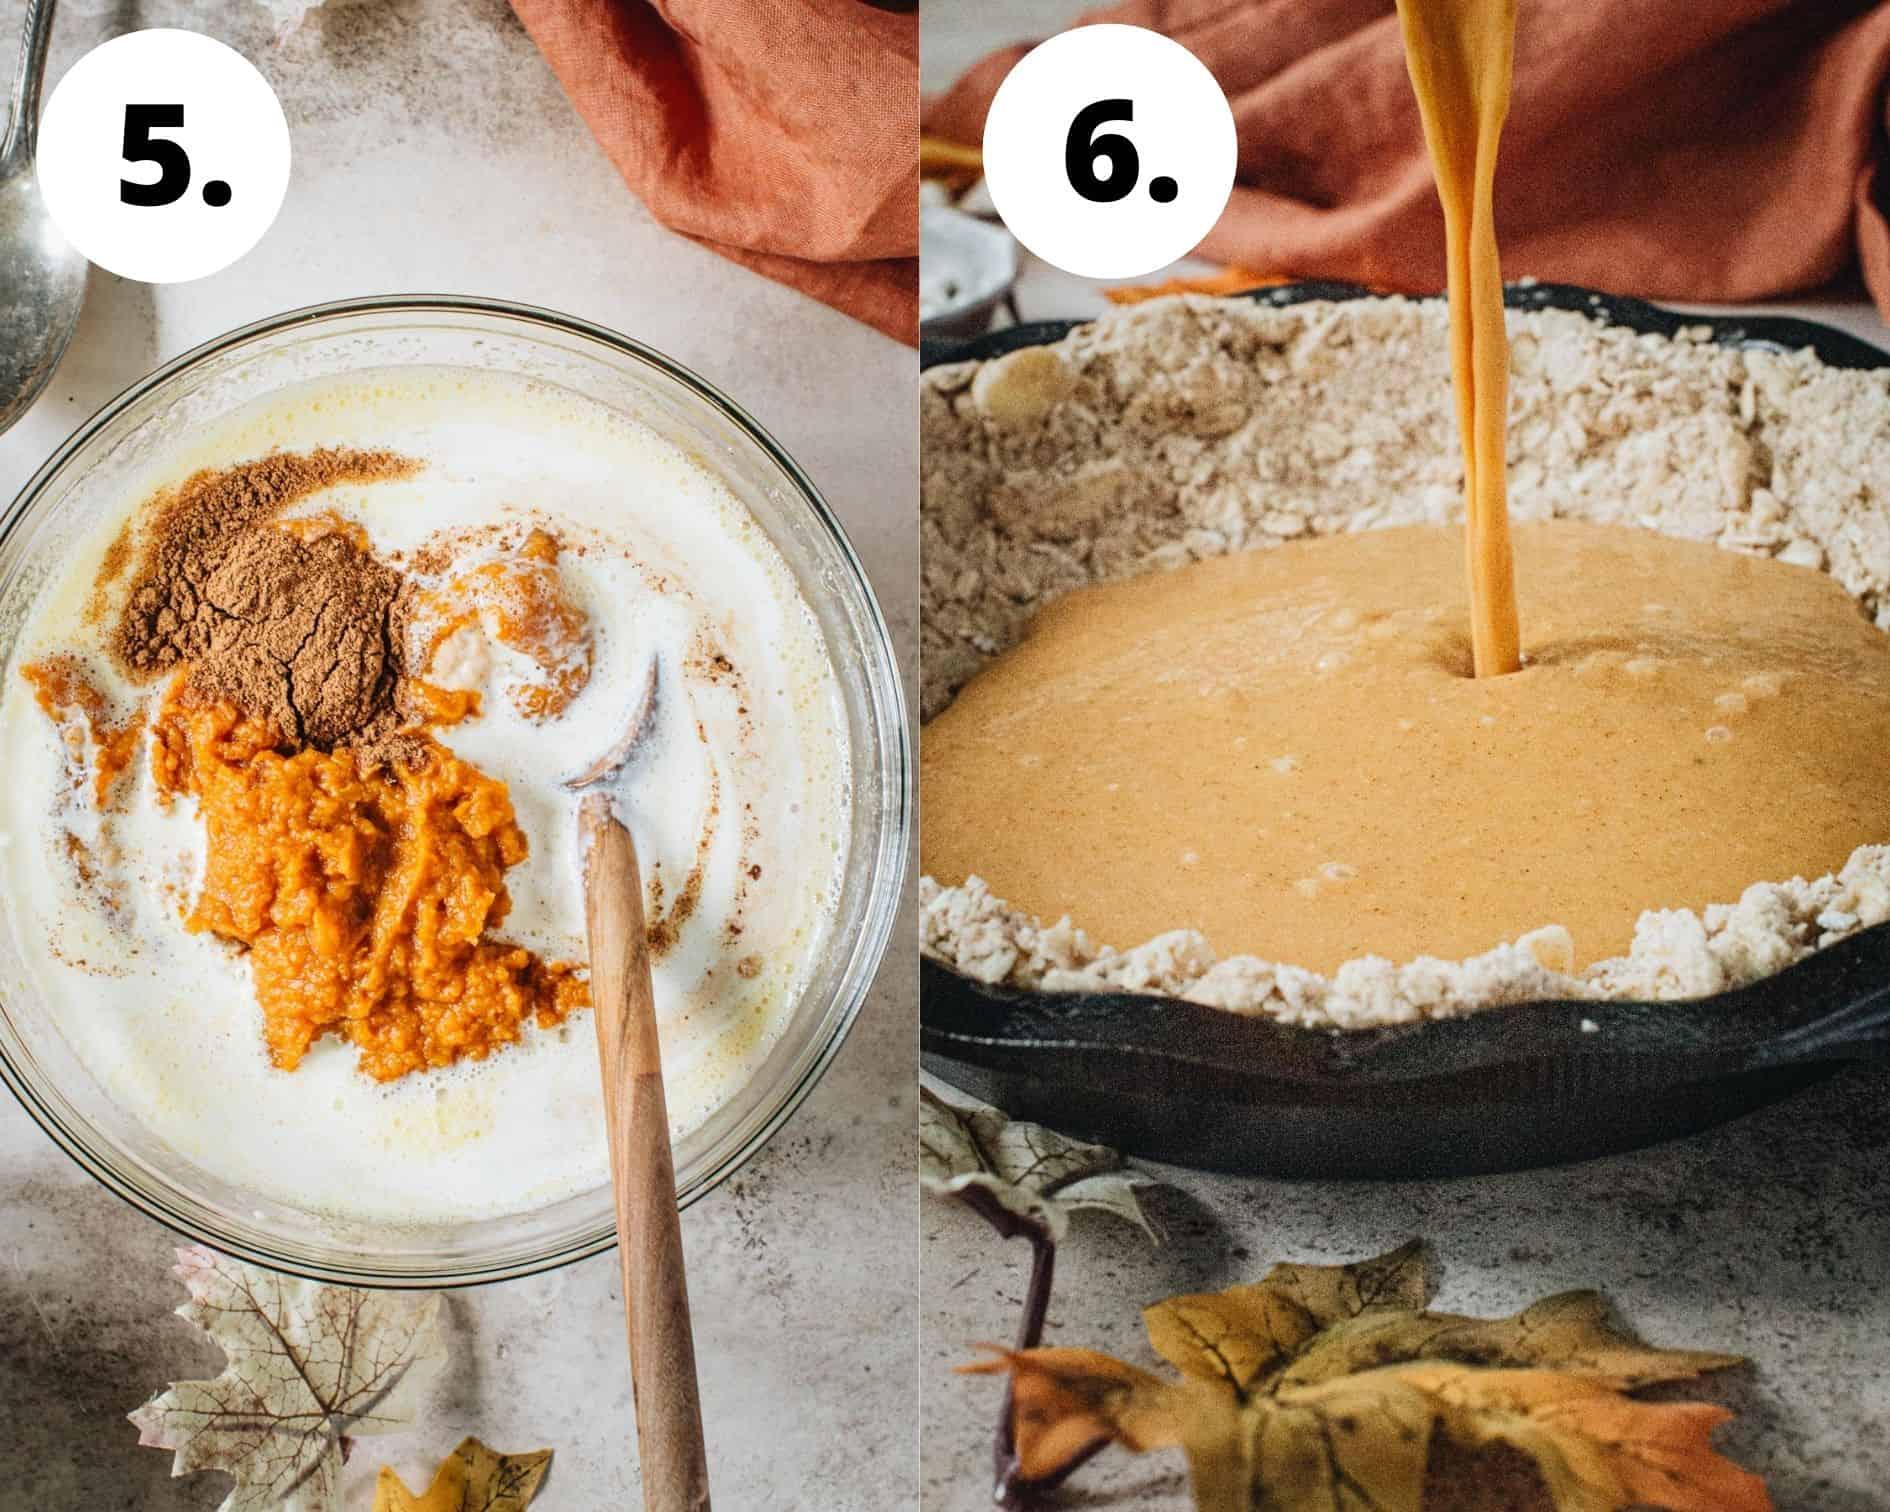 Pumpkin crisp process steps 5 and 6.